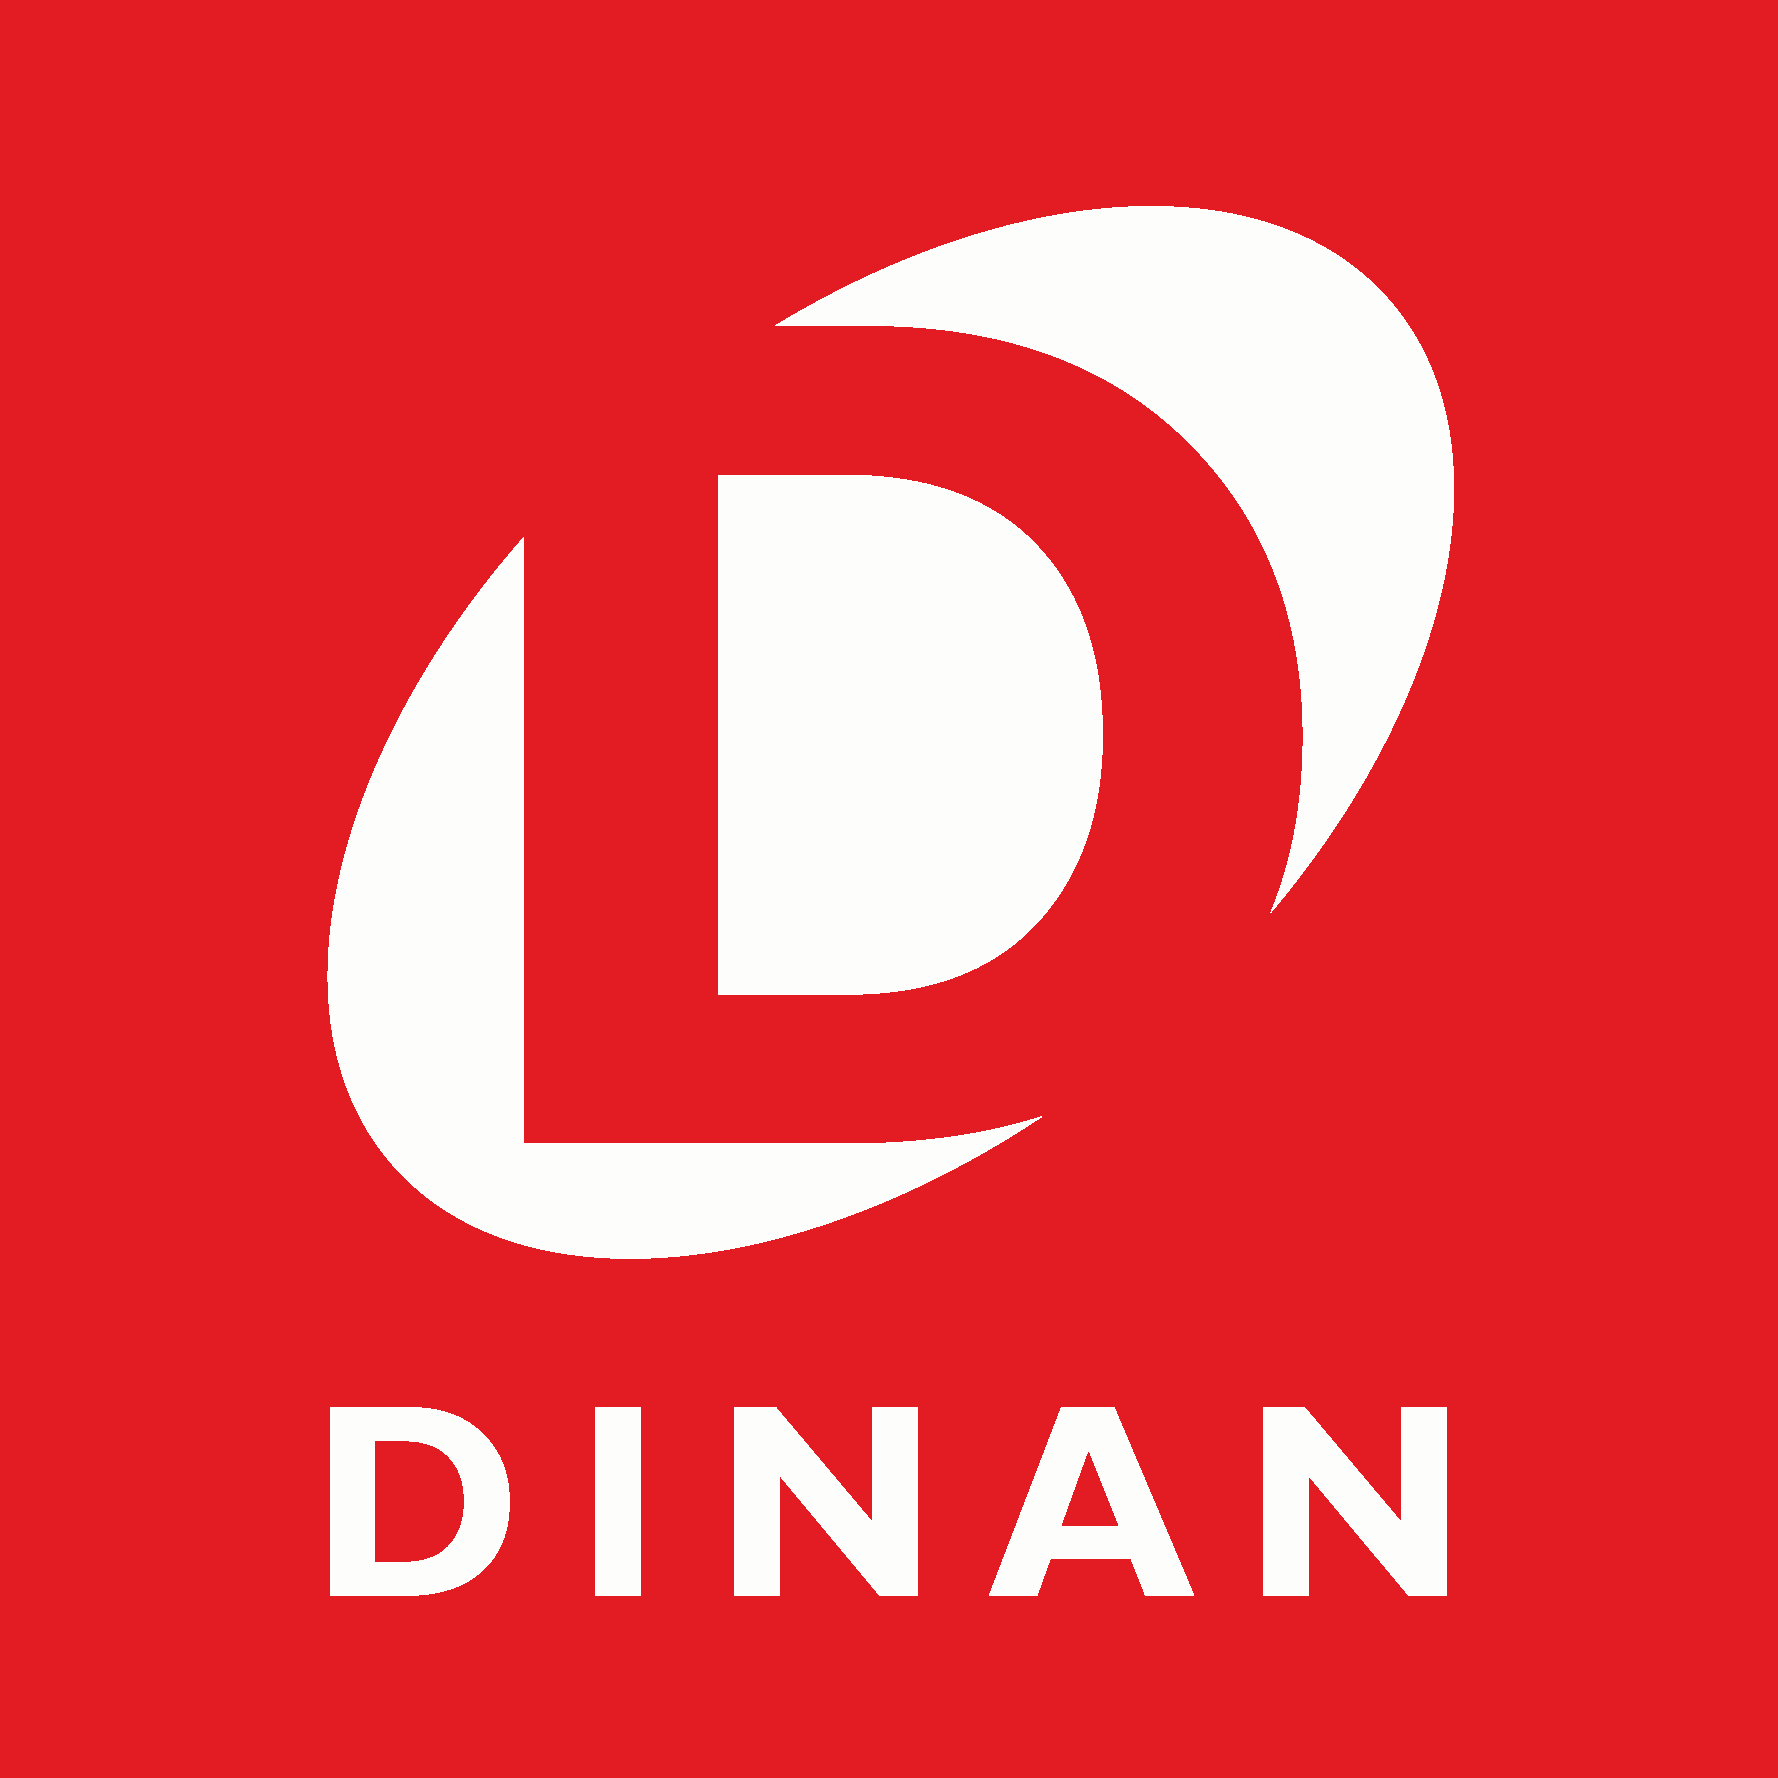 www.dinancars.com